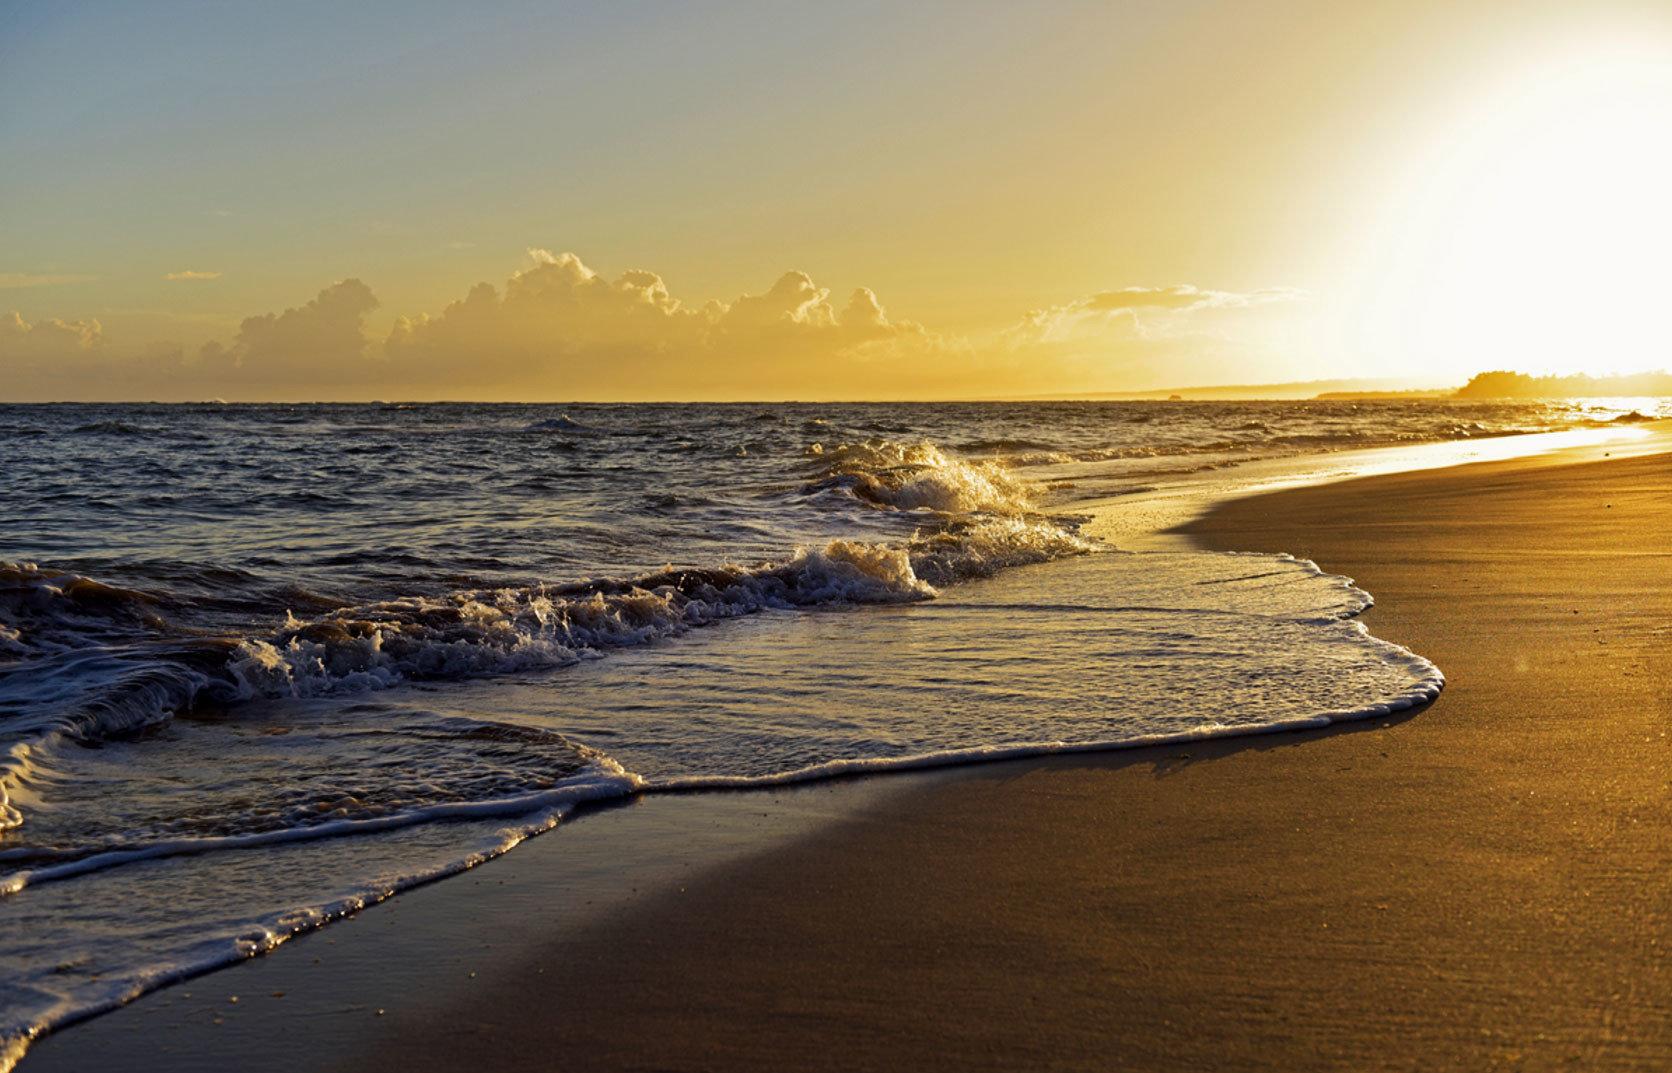 sky water shore Sea Coast Beach horizon Ocean wave sunrise Sunset dawn wind wave Nature morning cloud dusk evening sand rock sunlight